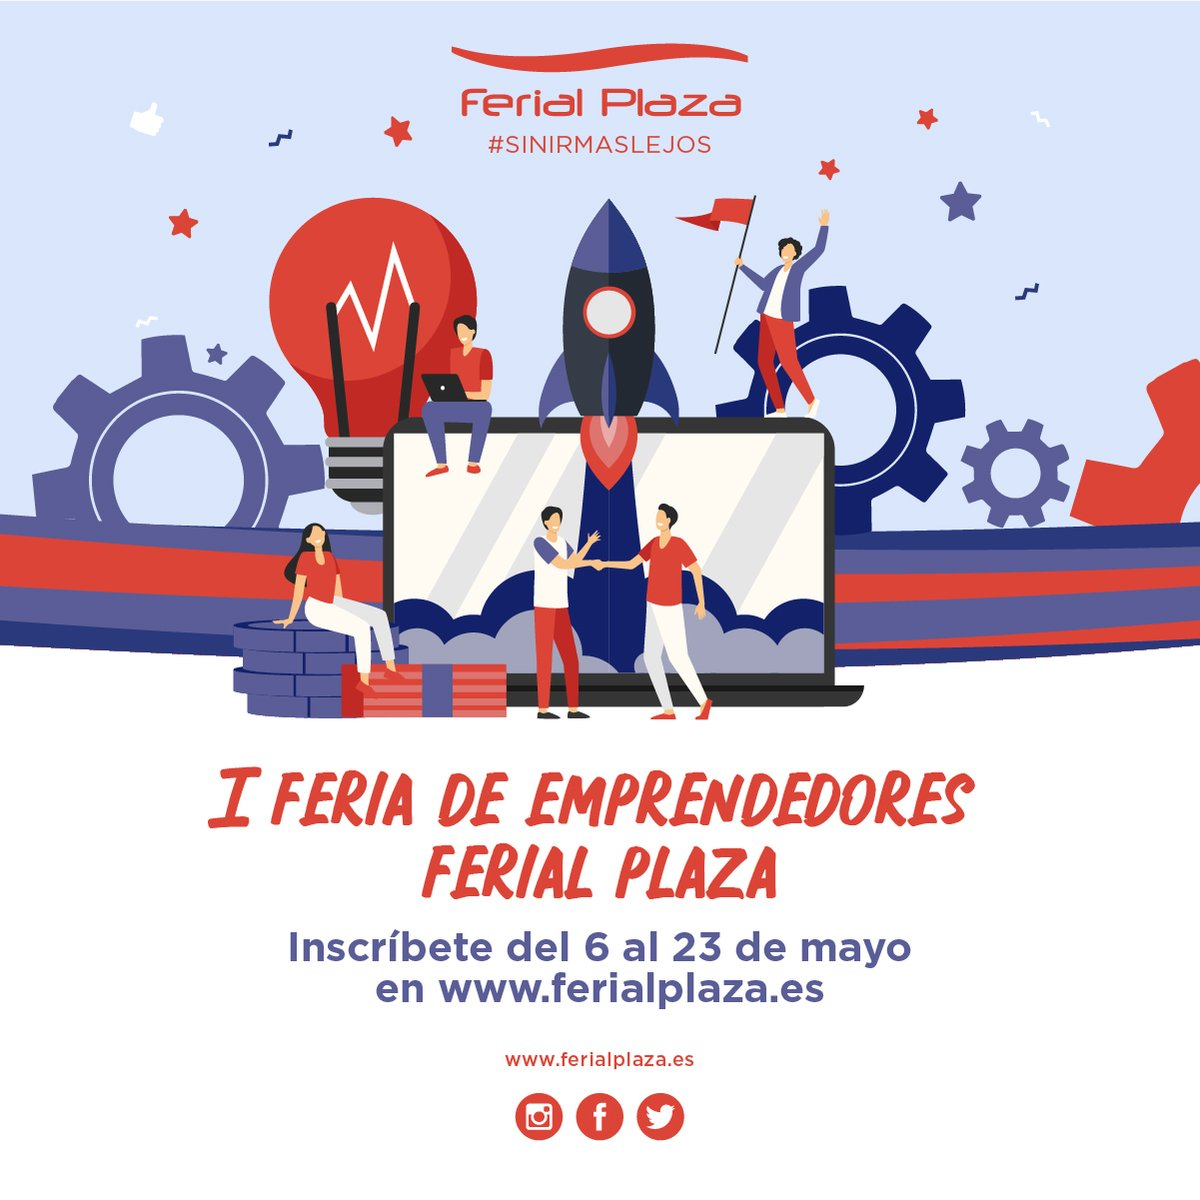 FerialPlaza photo